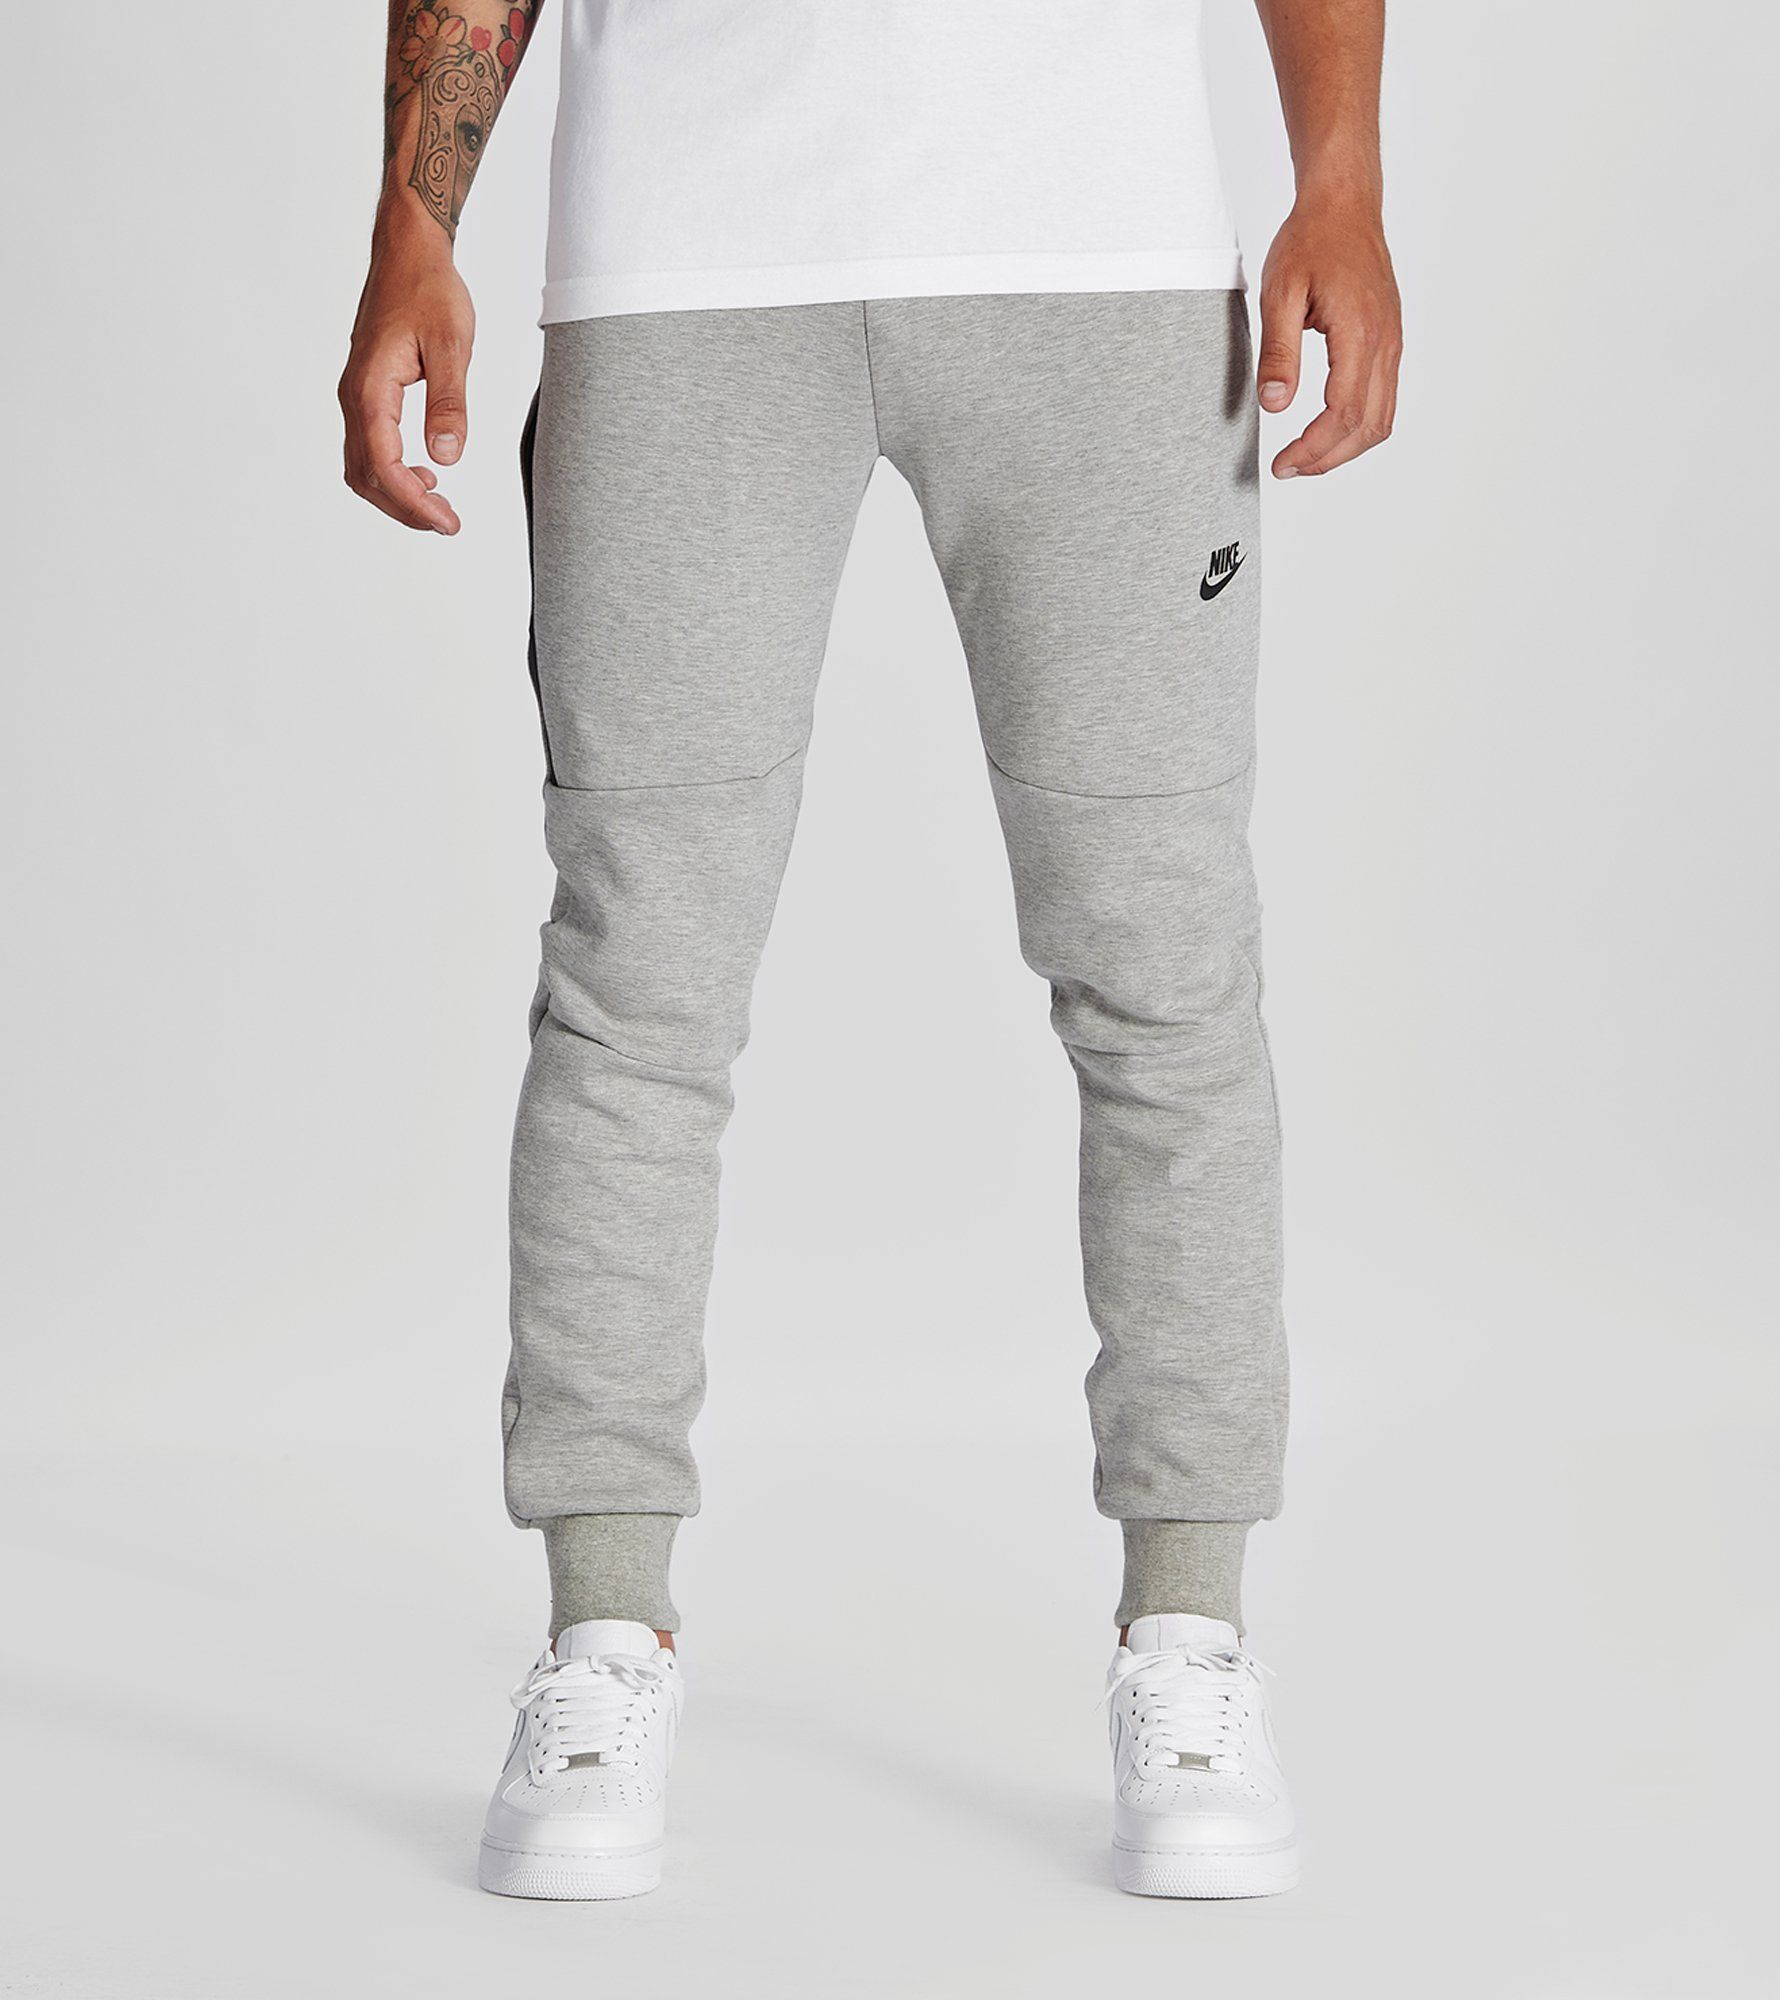 3b49b6d68077 Nike Tech Fleece Pants